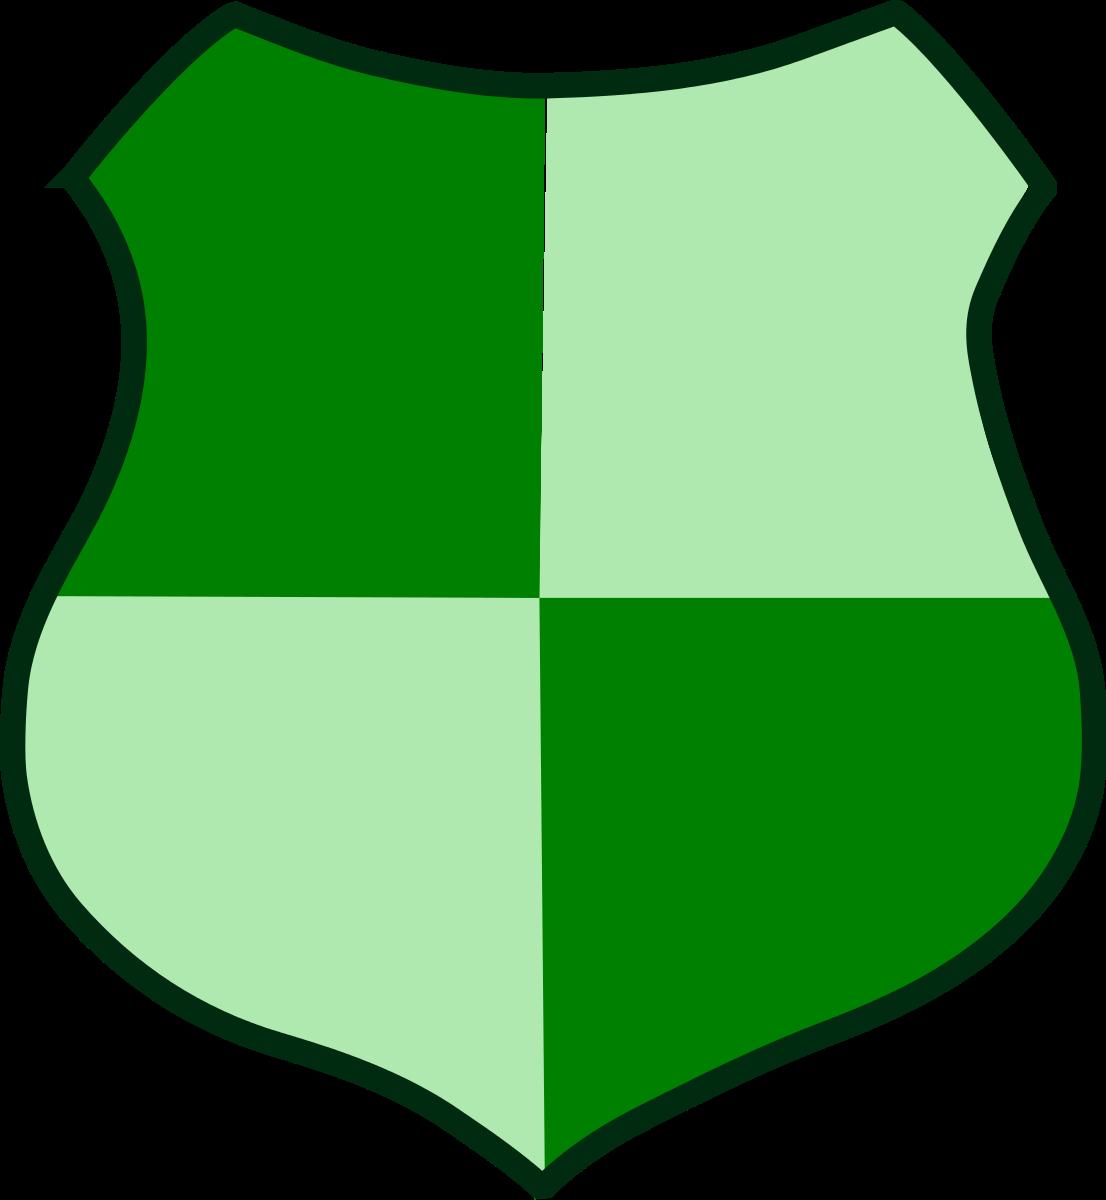 Shield Png 2